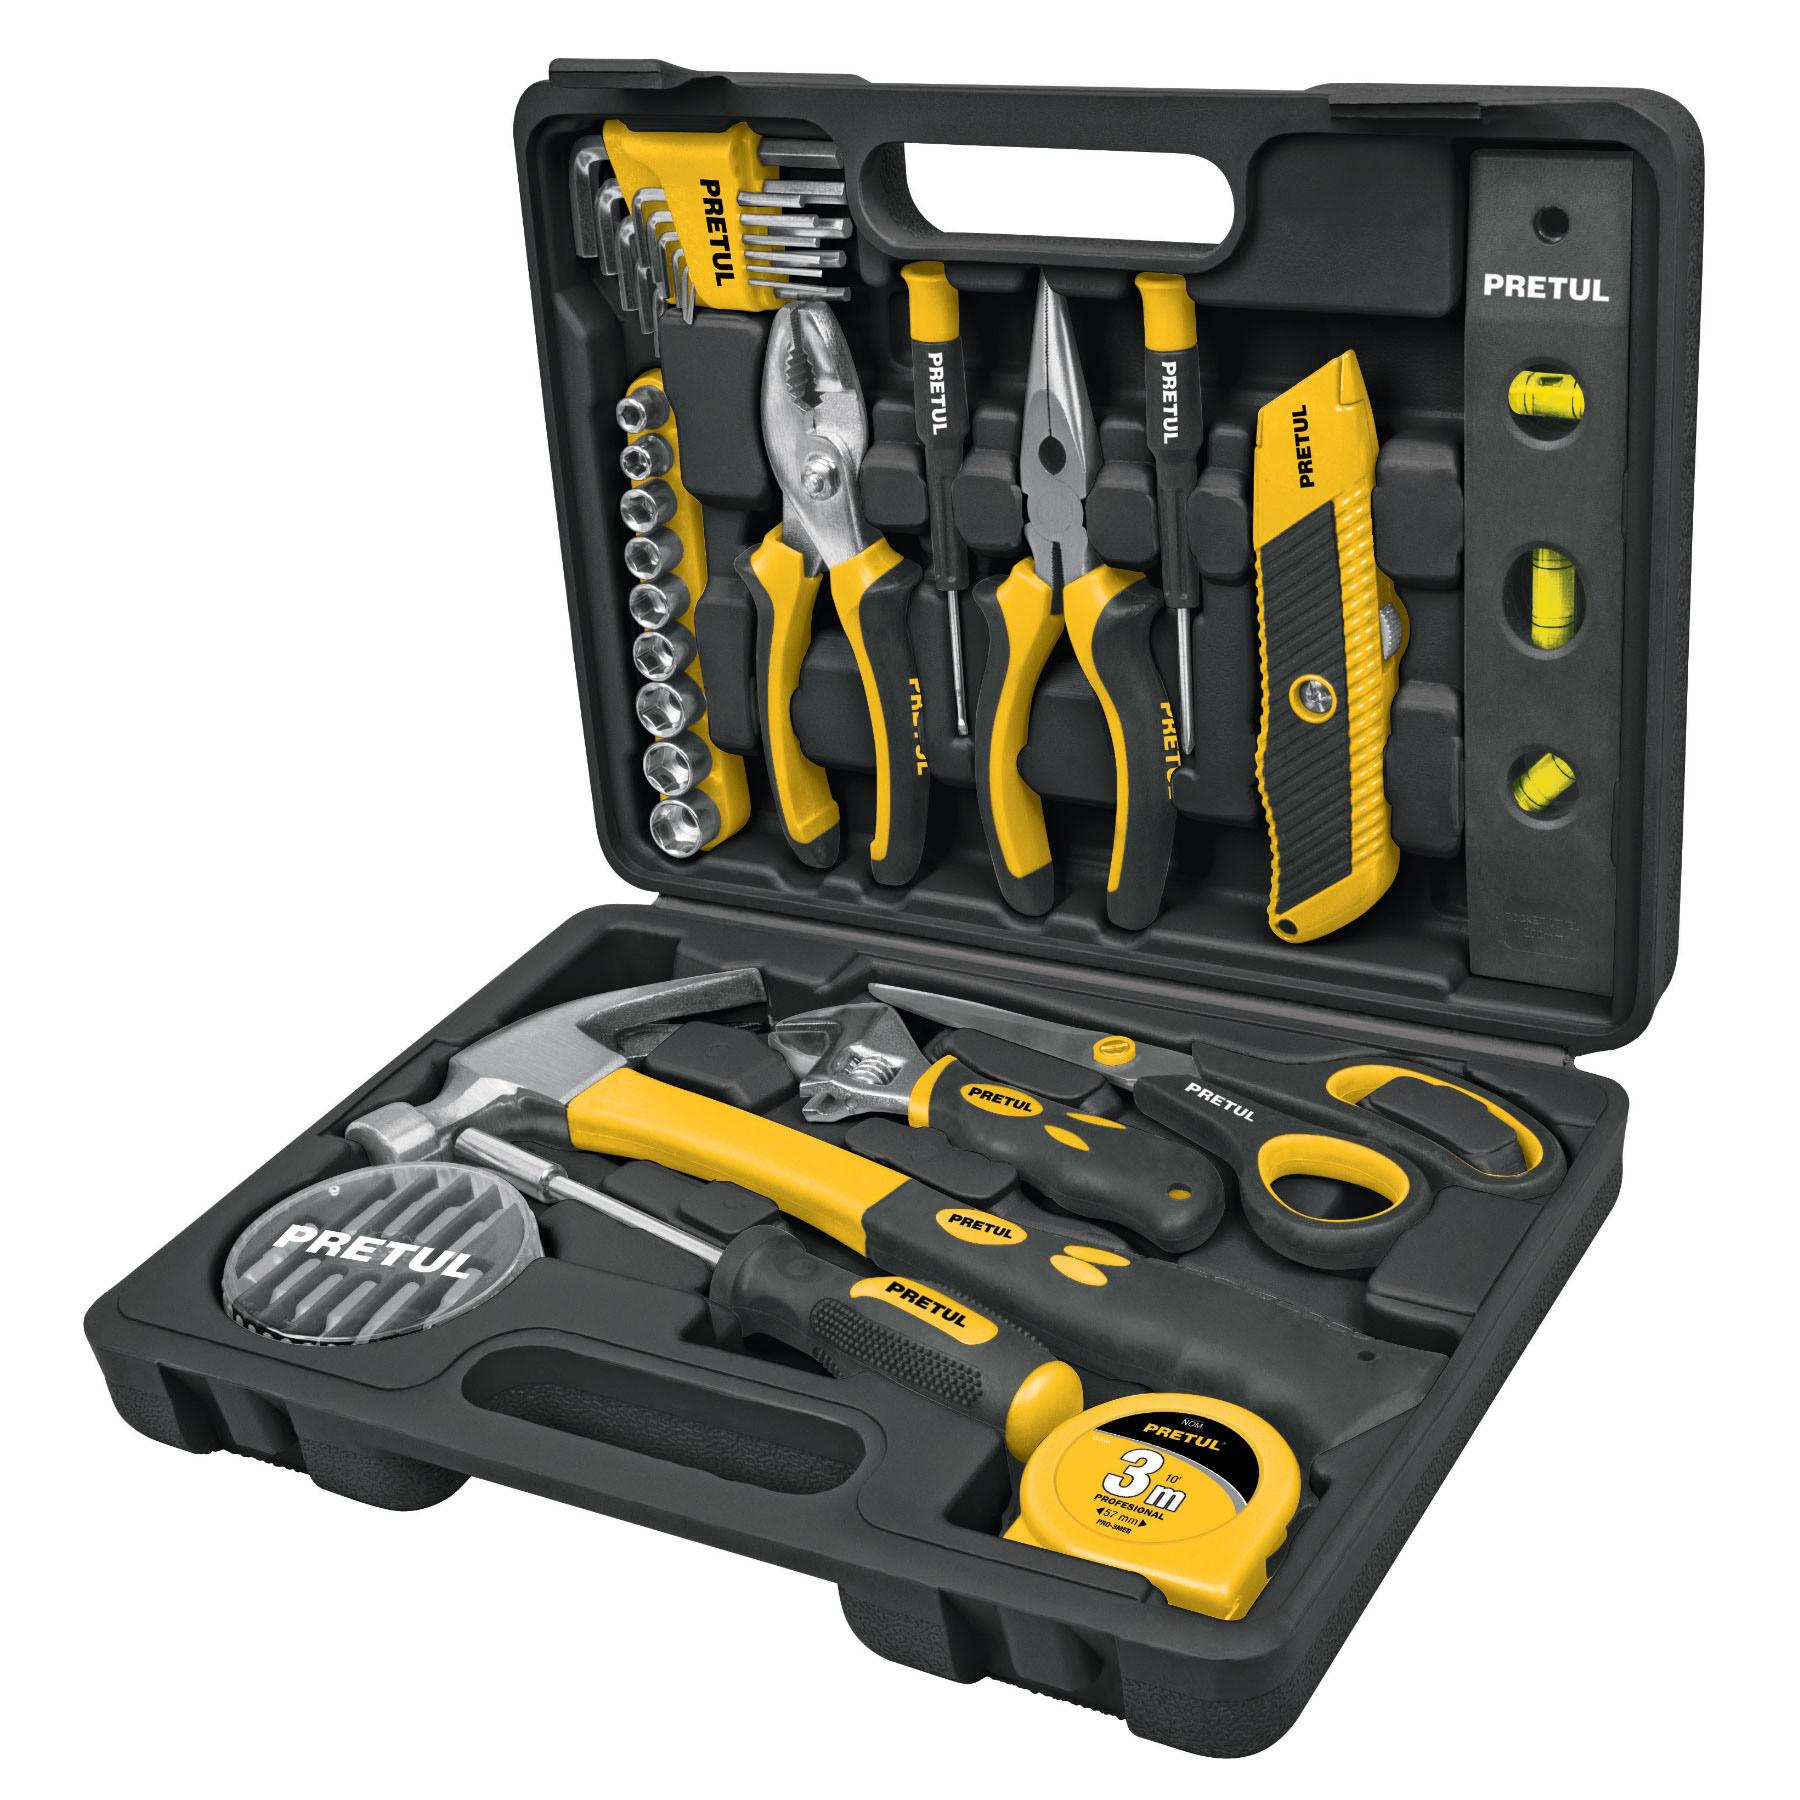 Pretul - Set de herramientas, 42 piezas, comfort grip, Pretul